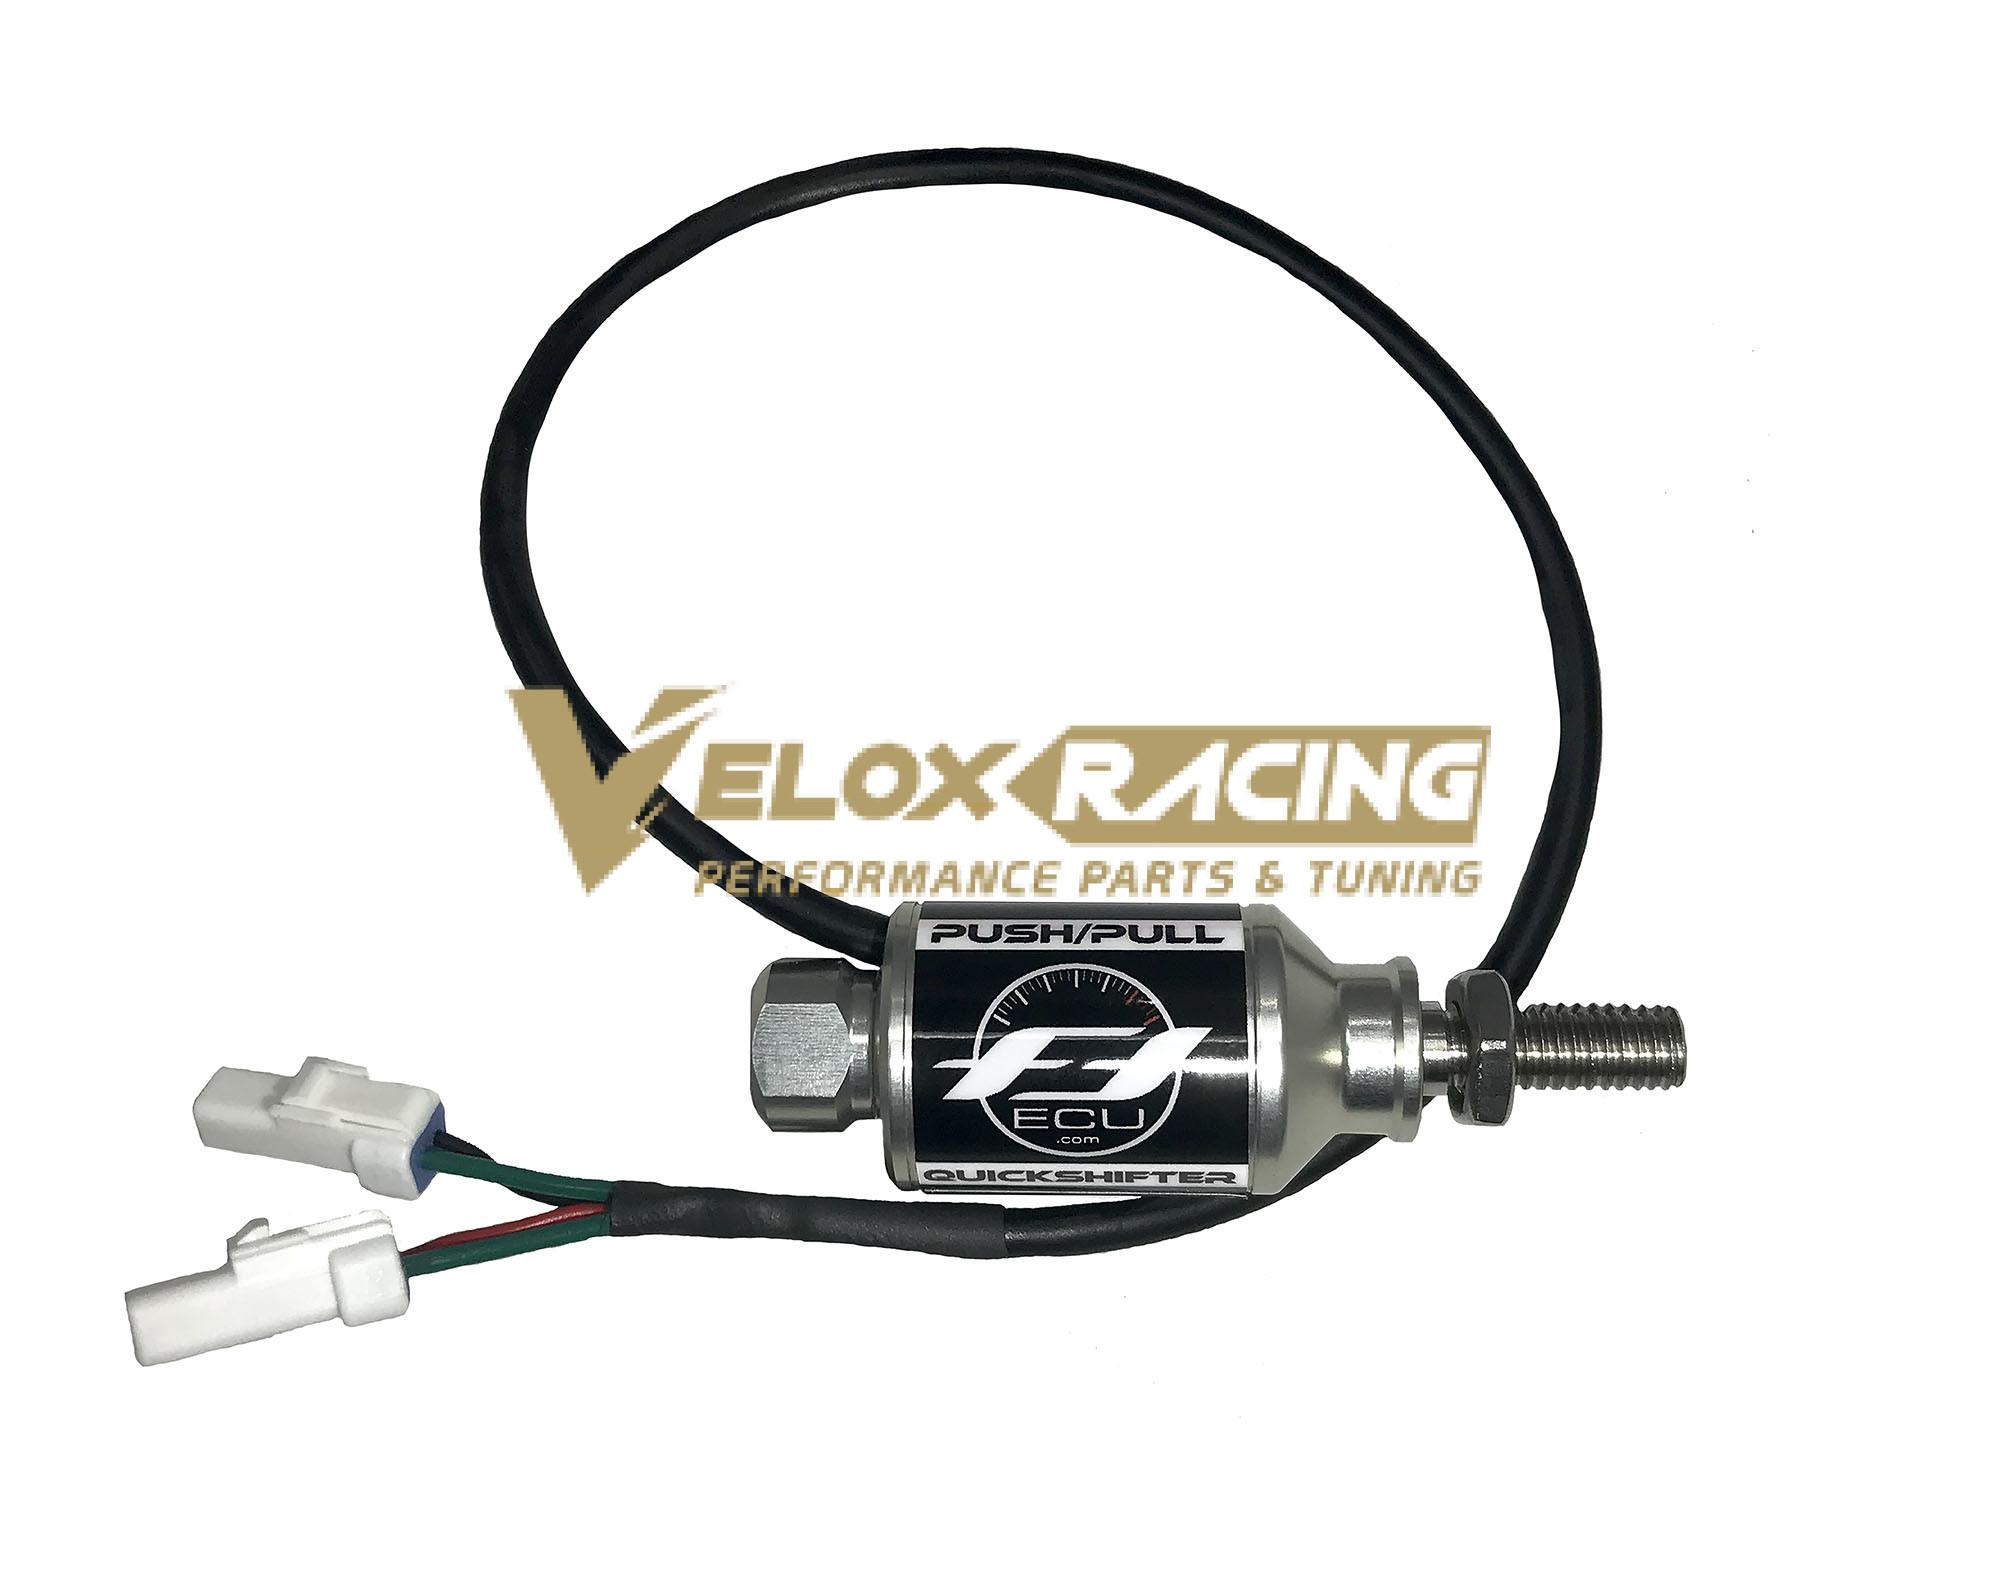 FTEcu dual direction blipper quickshifter sensor